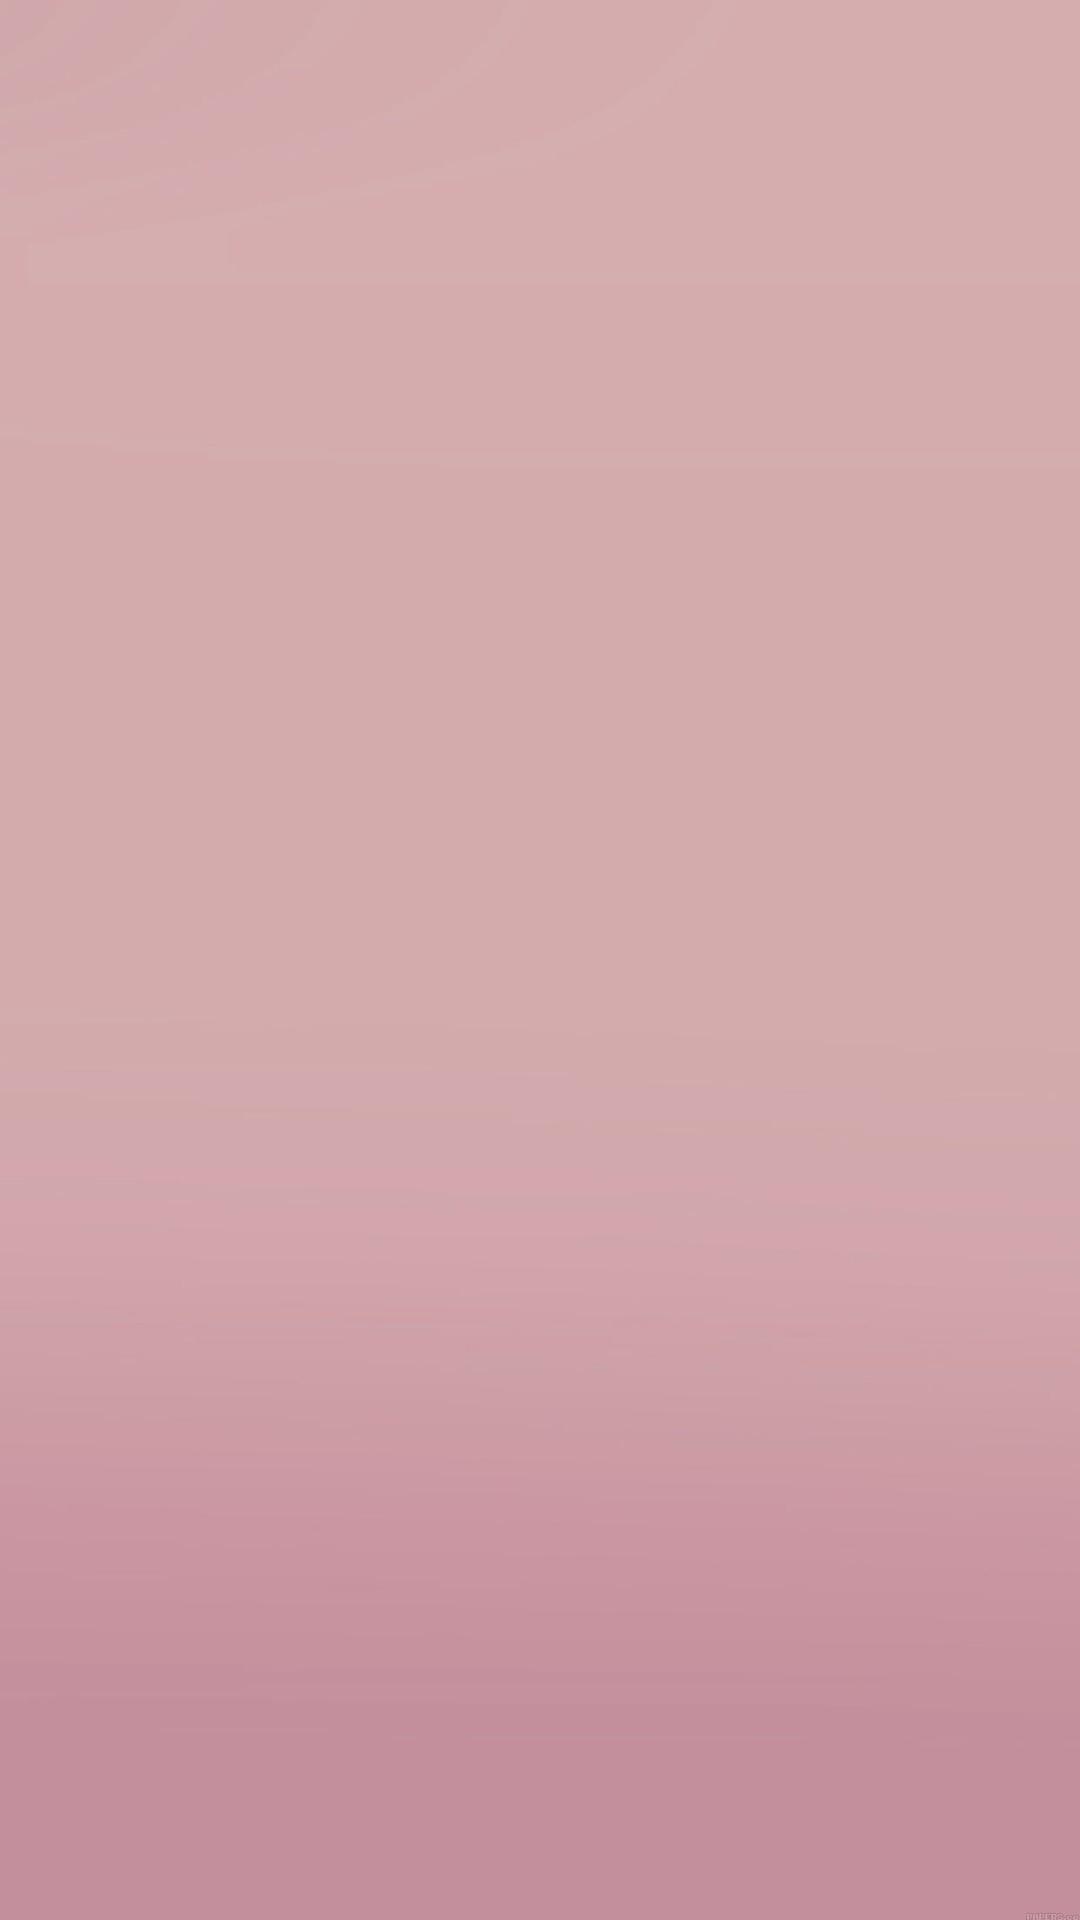 Light Pink iphone